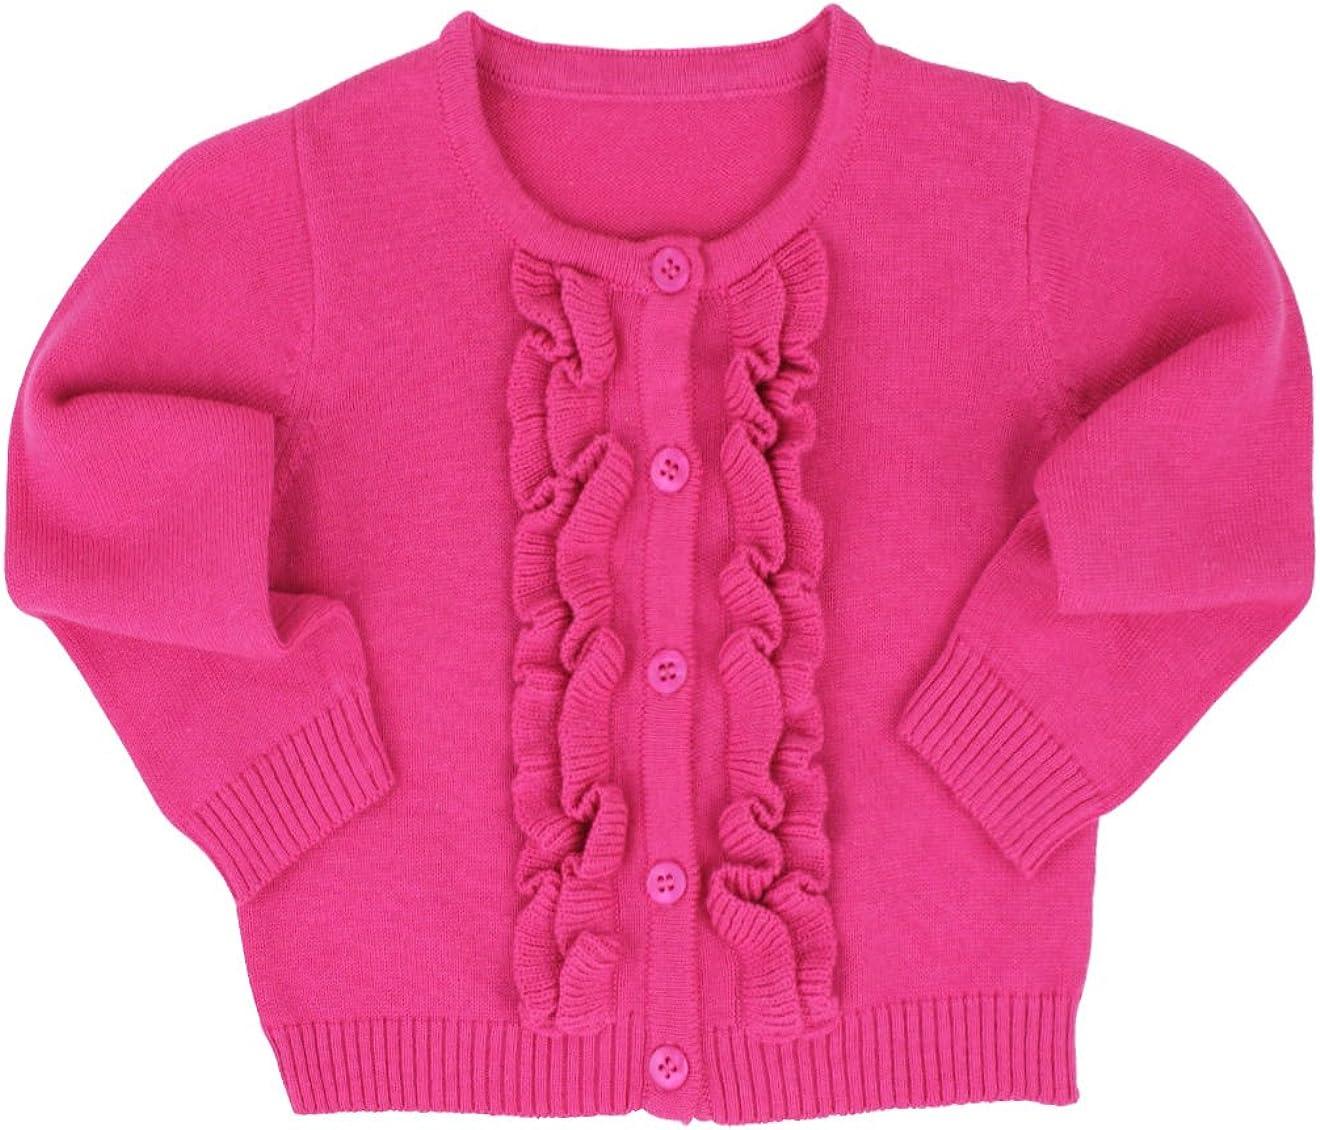 RuffleButts Baby//Toddler Girls Ruffled Long Sleeve Cardigan Button-Up Sweater